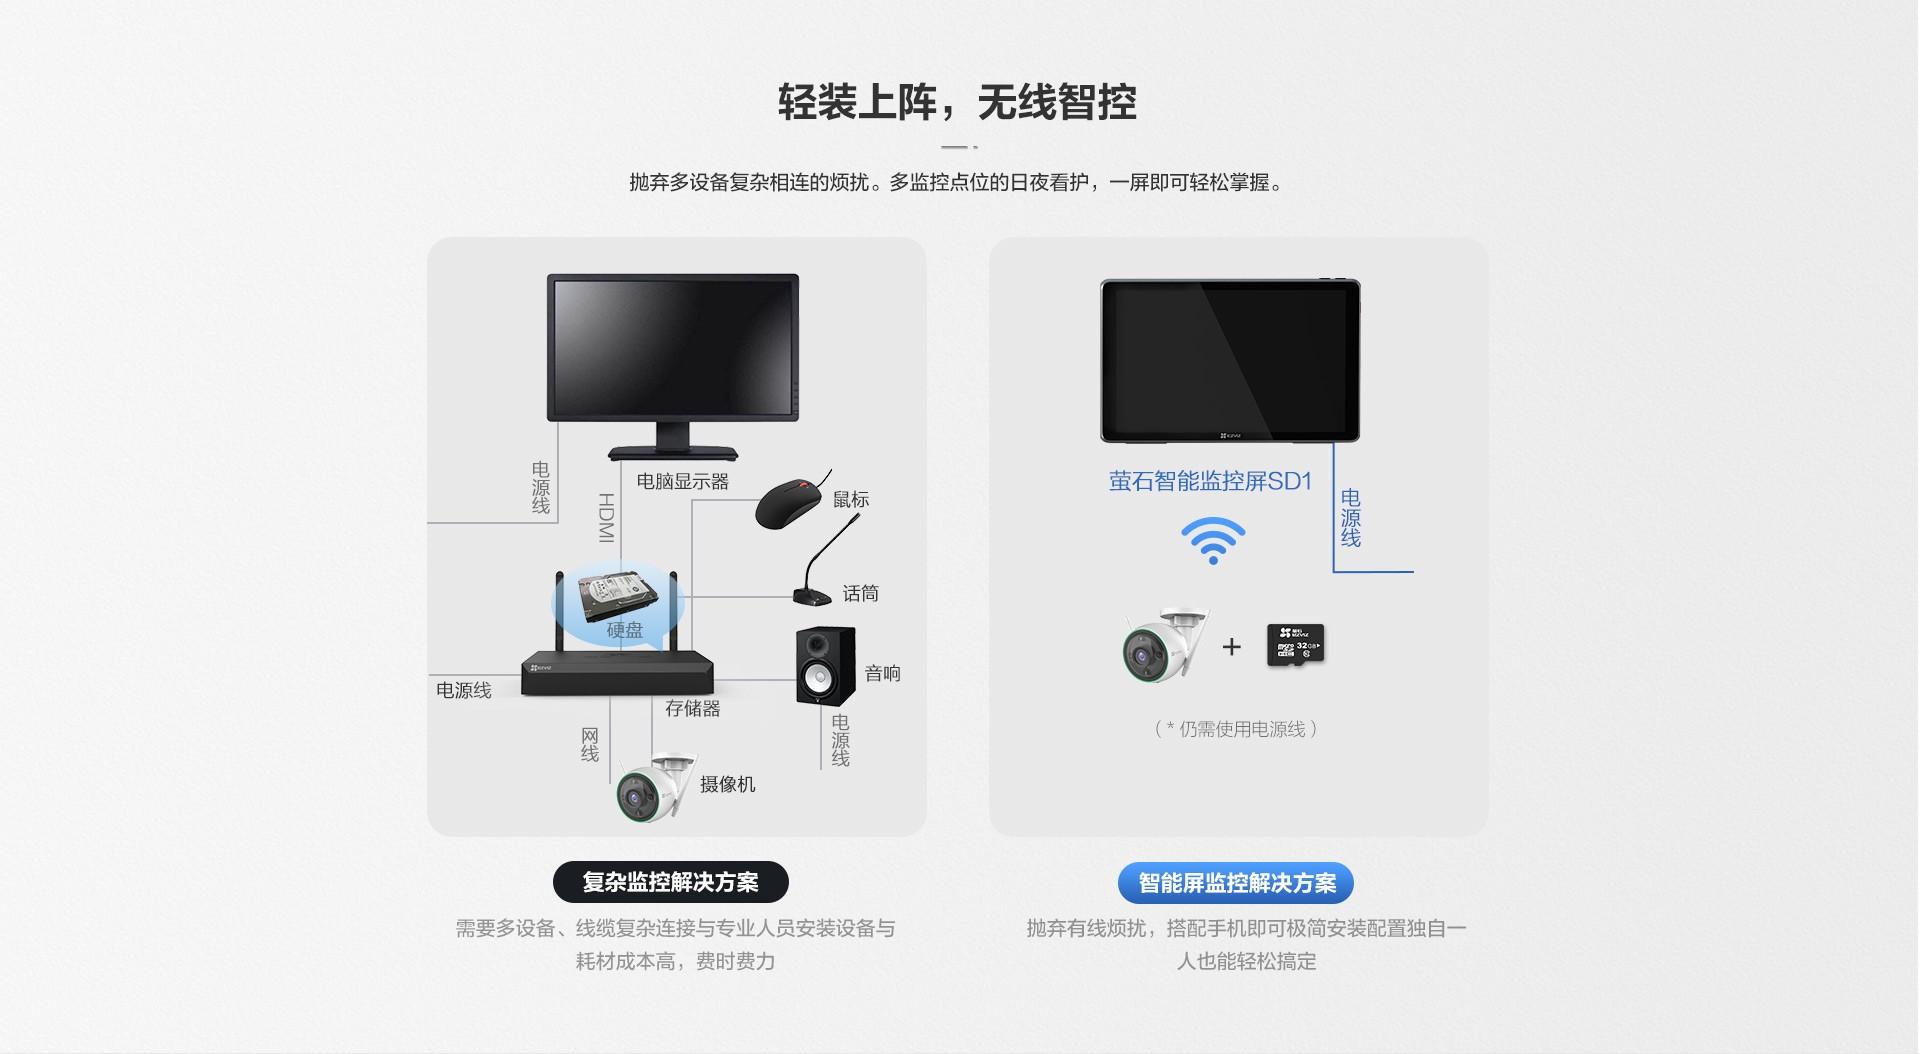 C3C+智能屏+卡套装-web_03.jpg